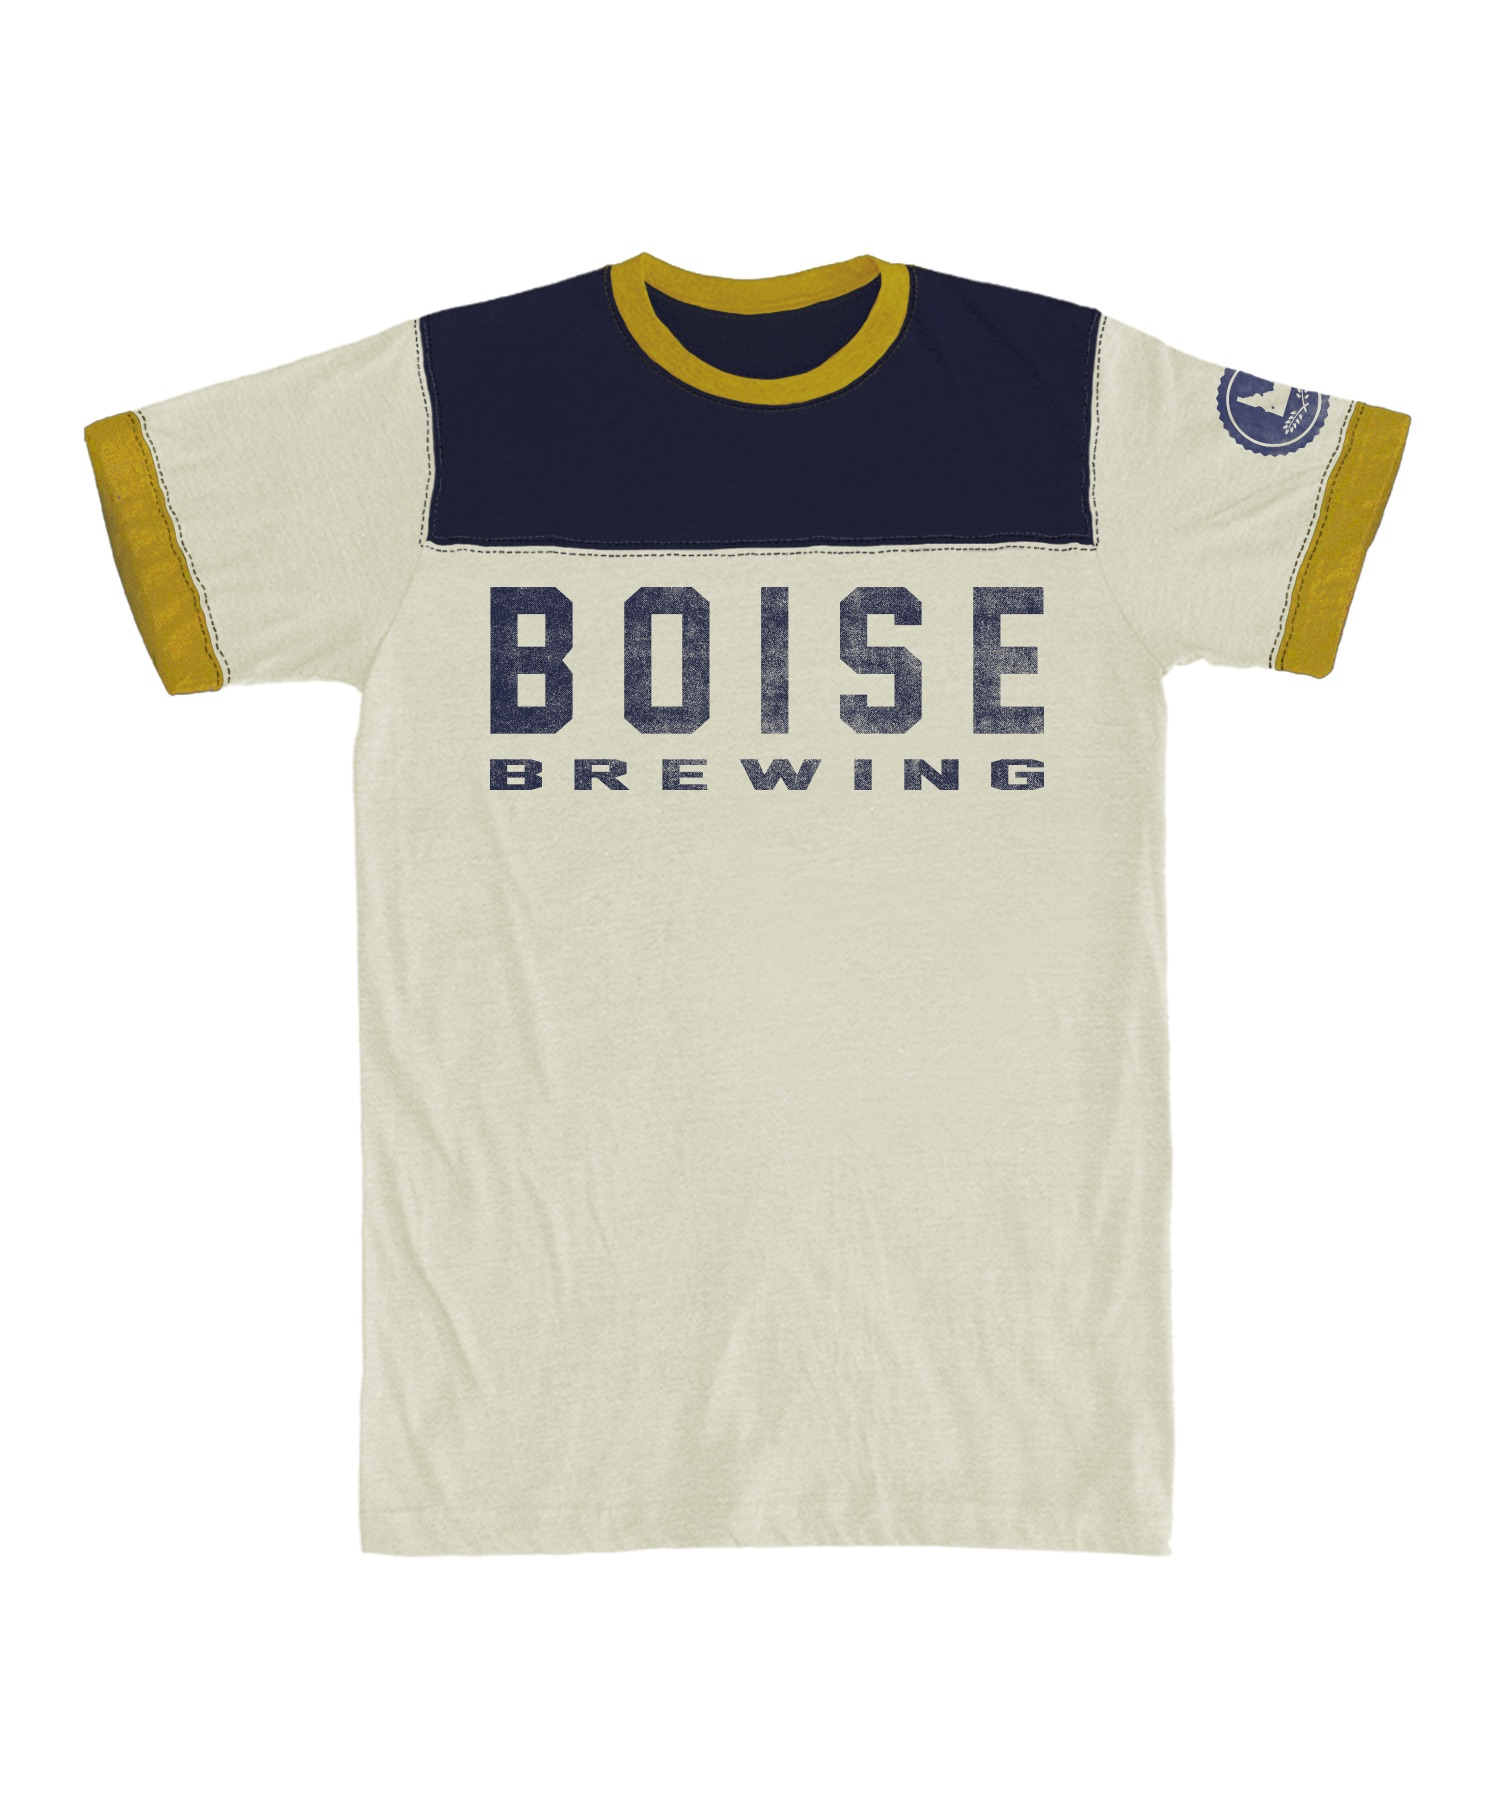 BoiseBewing_College_Football_Crew_VinWhiteNavySunshine.jpg